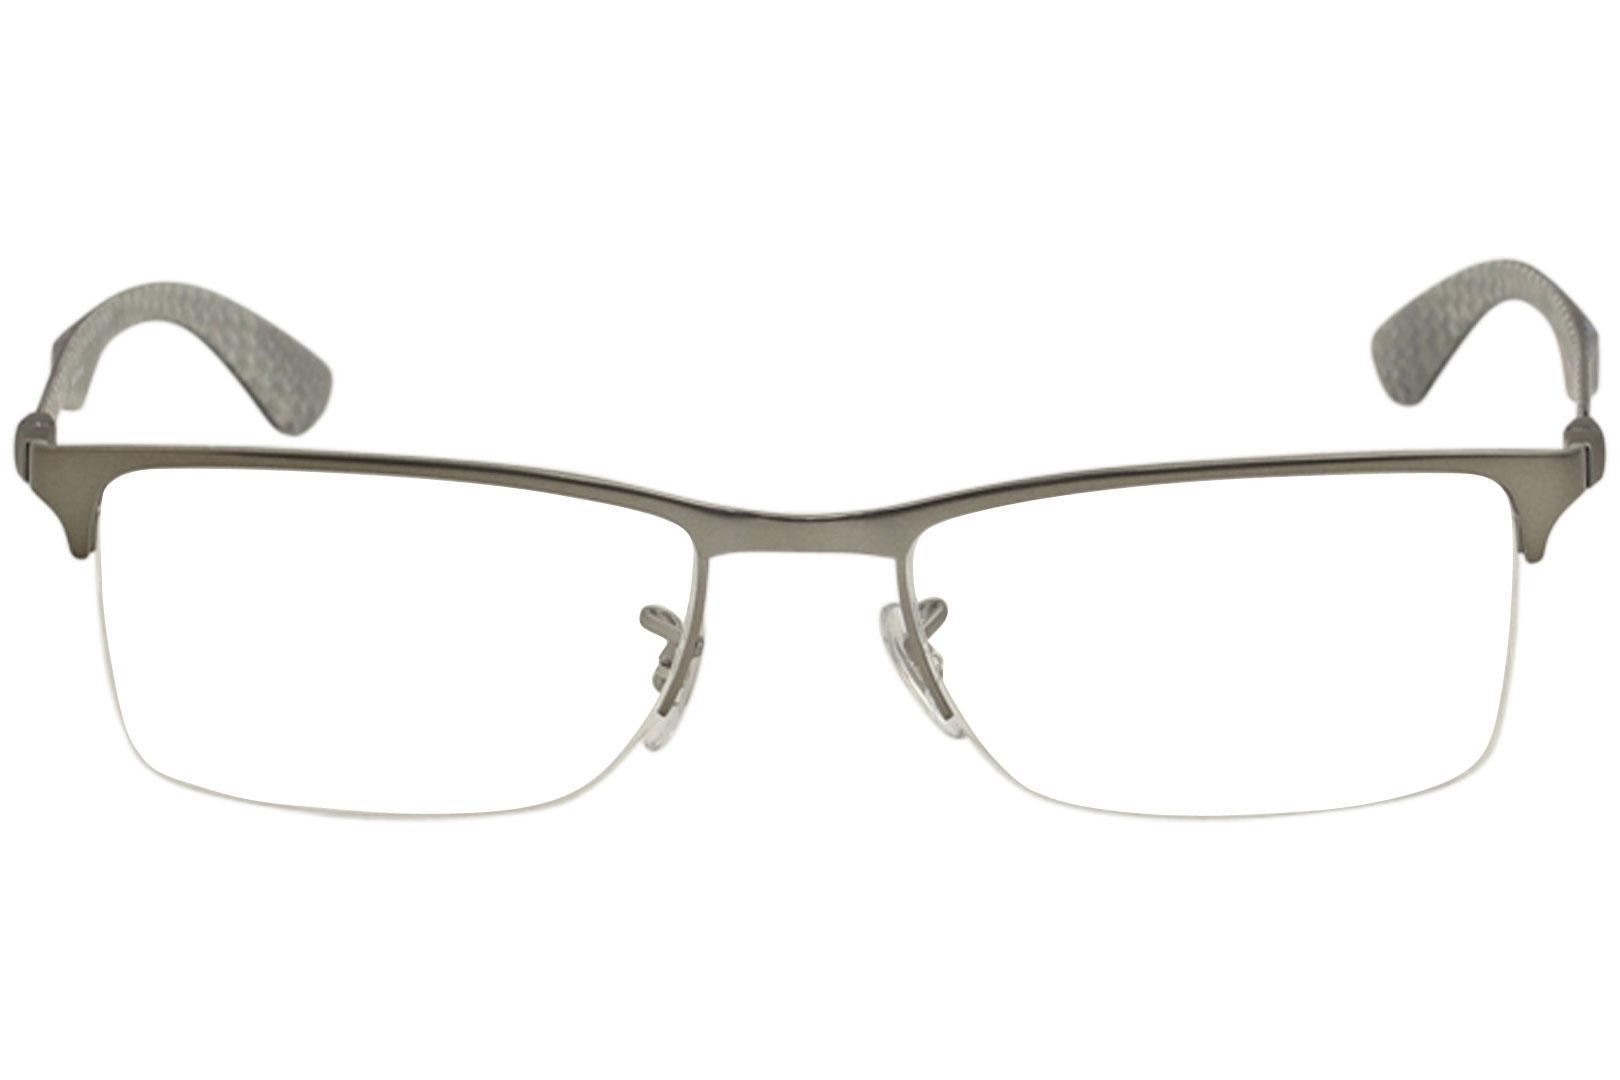 ec20073dce ... order ray ban mens eyeglasses rx8413 rx 8413 rayban half rim optical  frame by ray ban